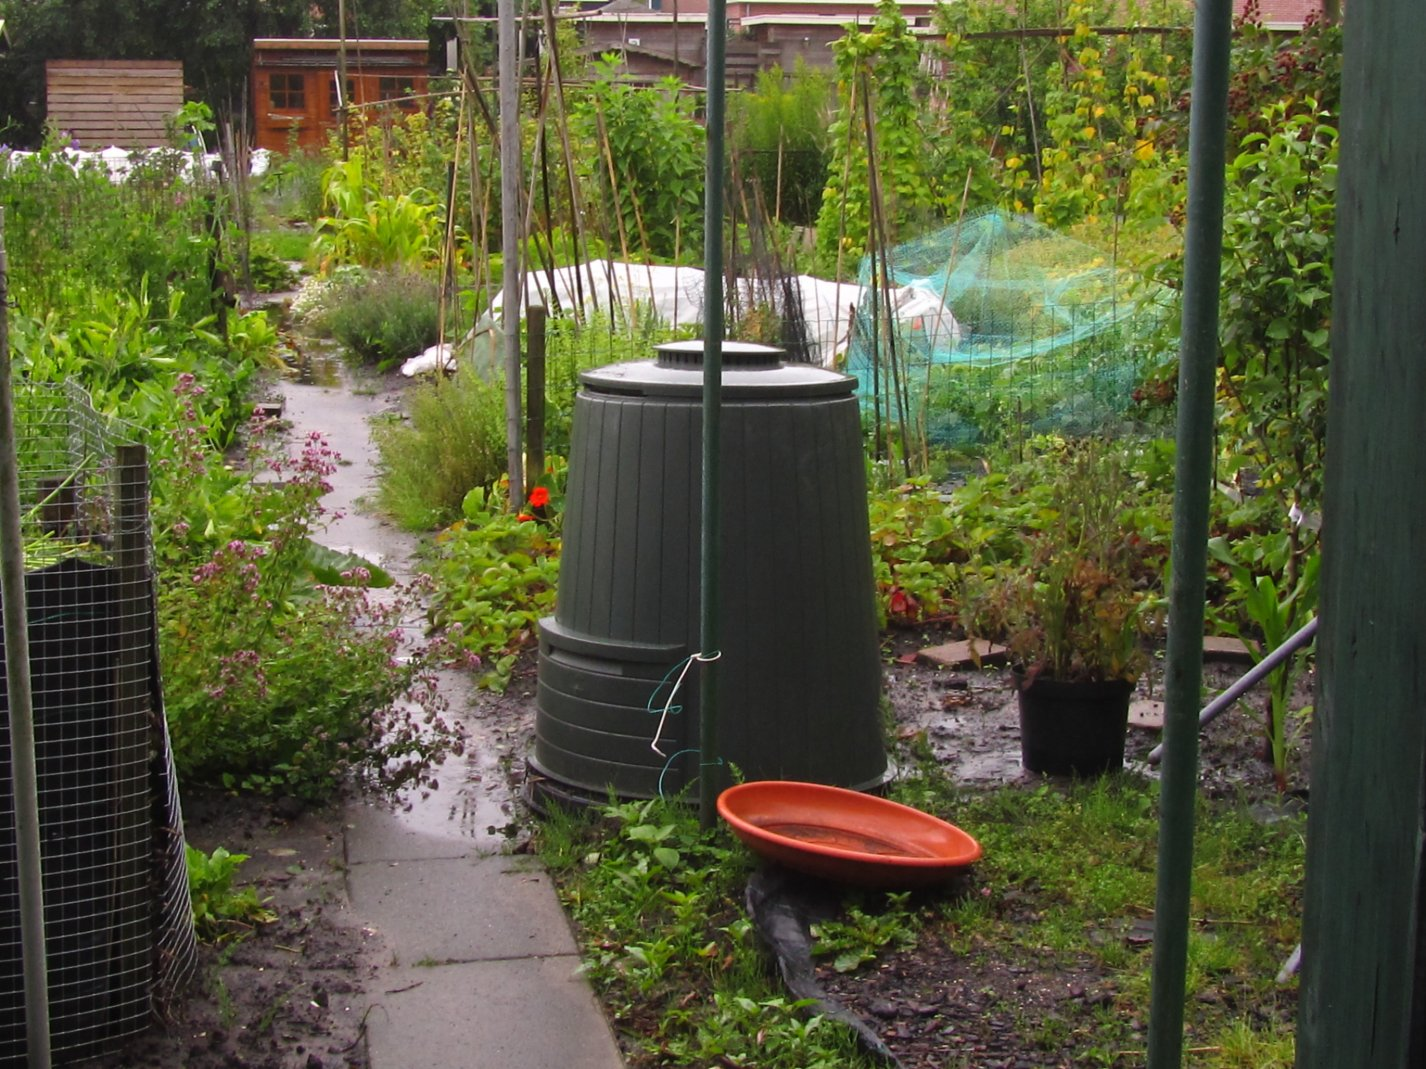 Hoe krijg ik mijn tuin minder nat - Hoe amenager tuin ...